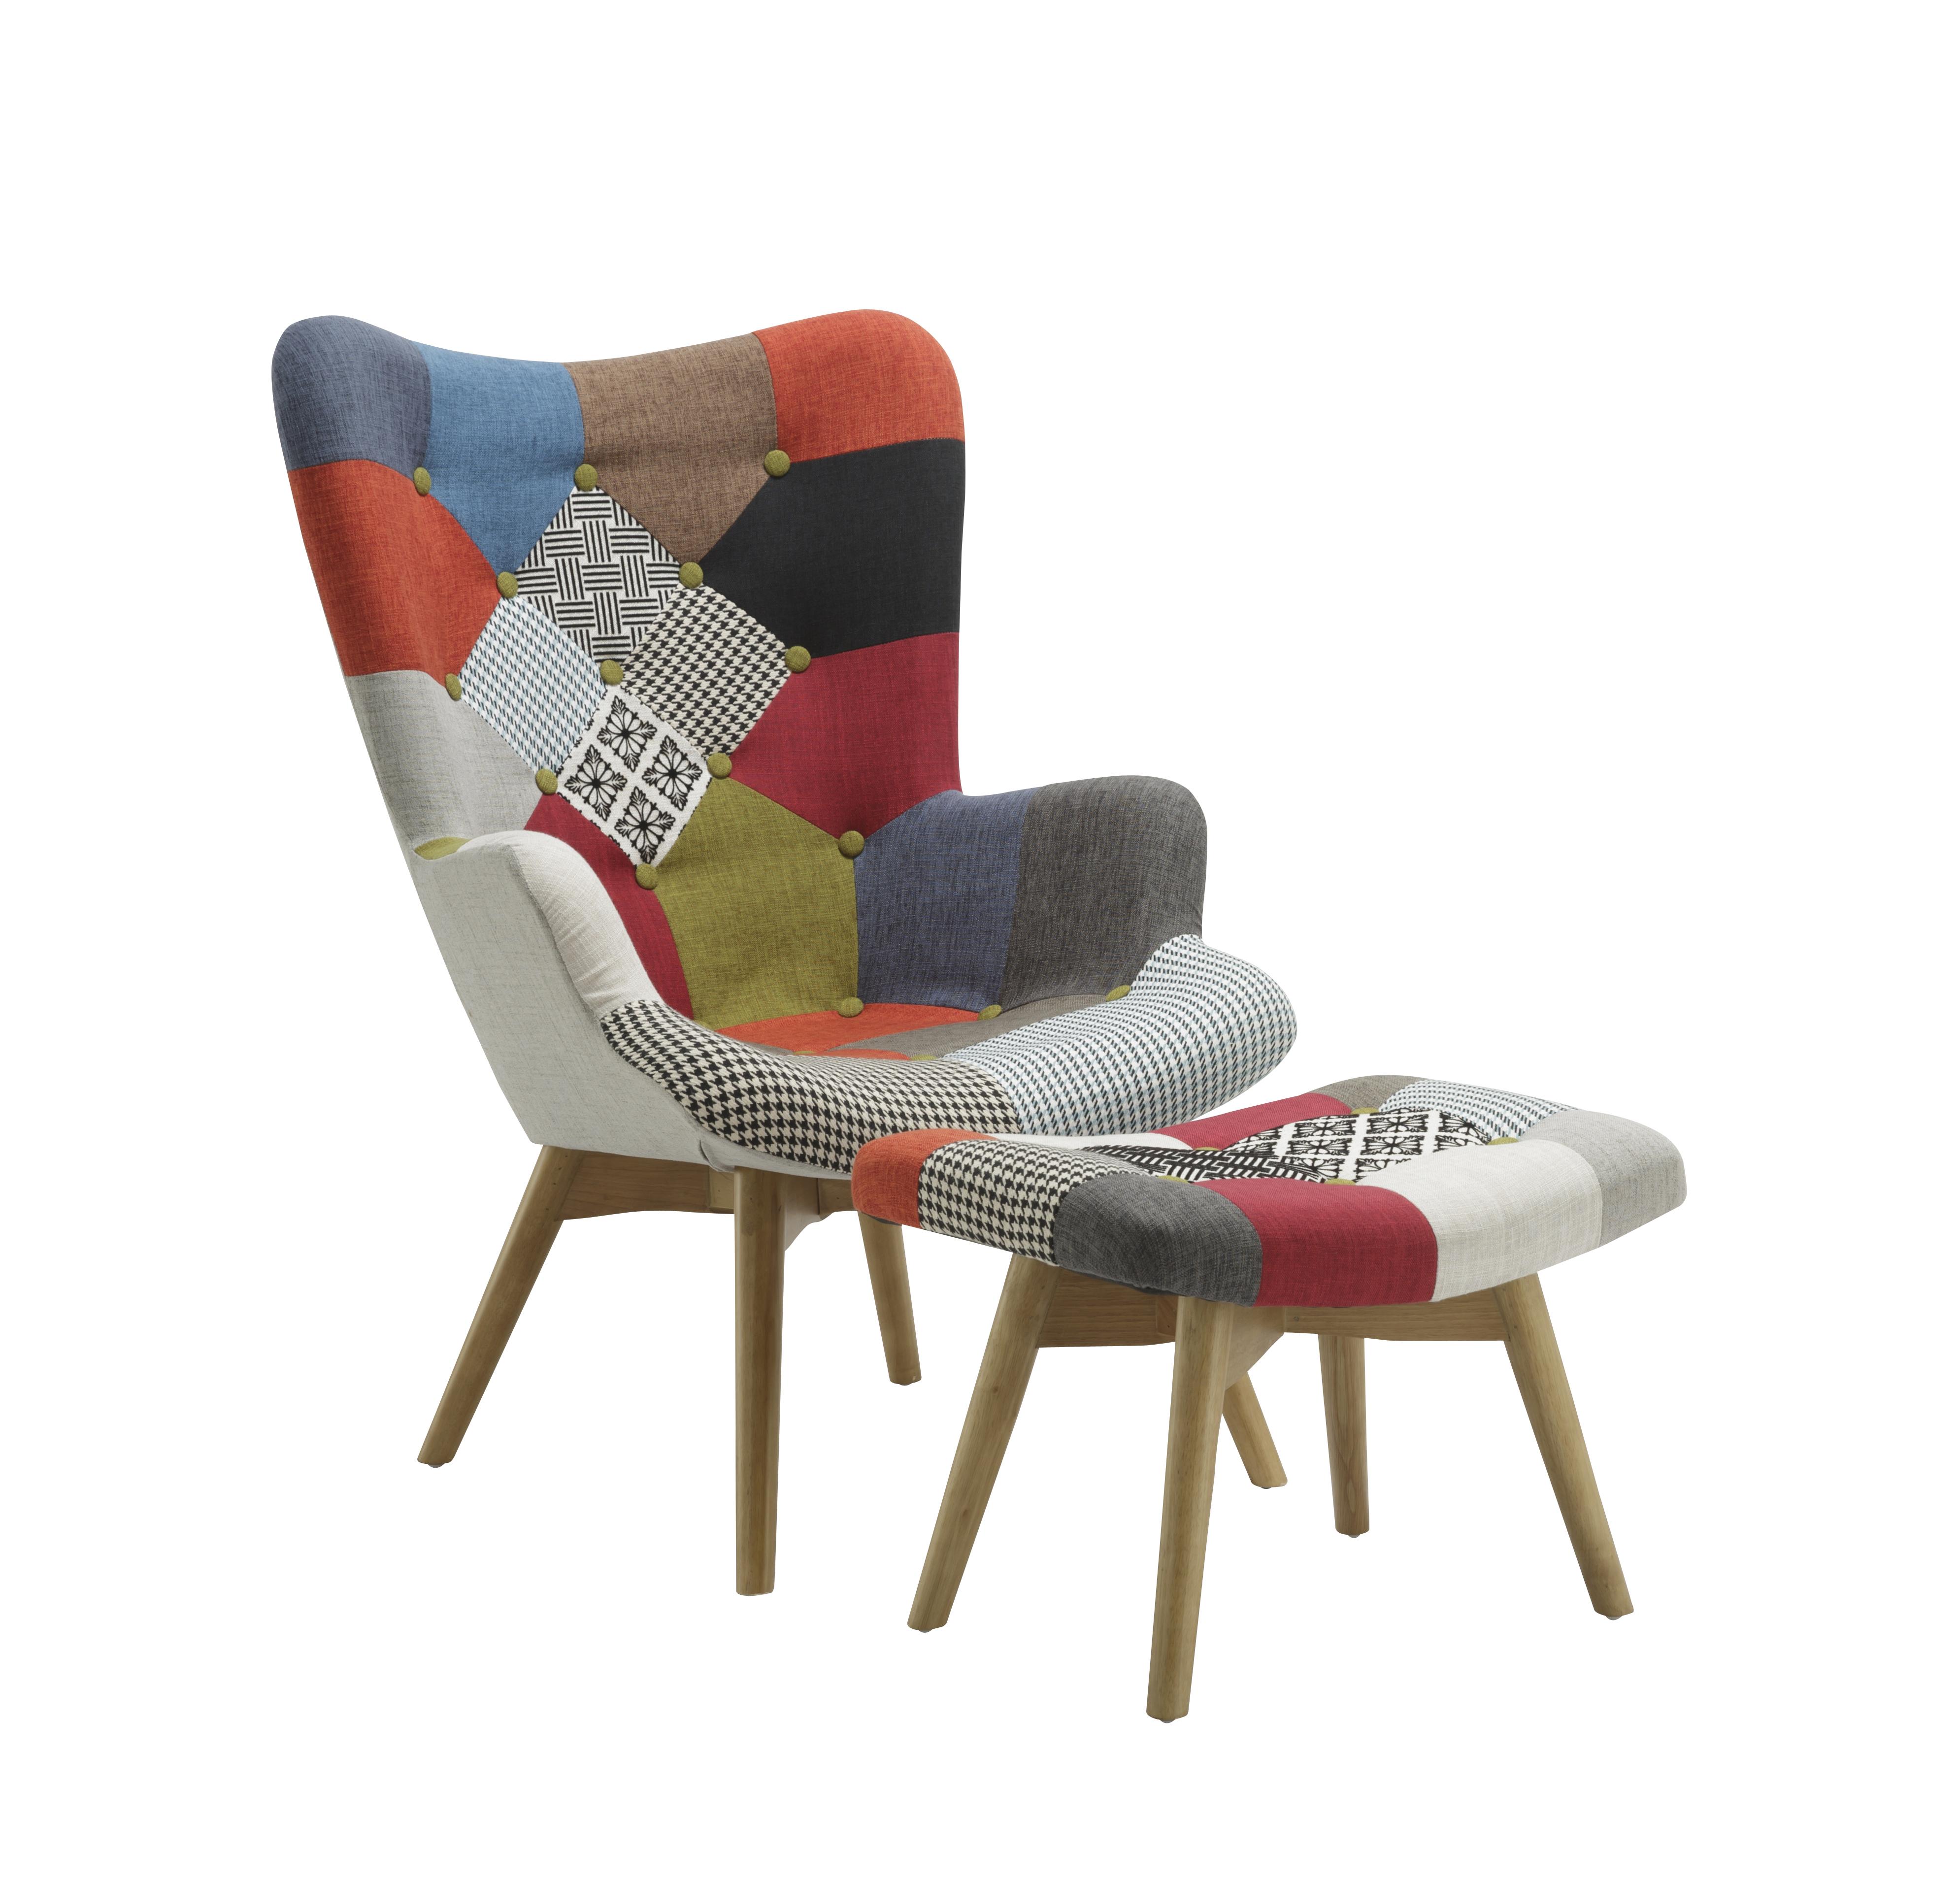 Details About Birlea Sloane Modern Designer Patchwork Armchair Stool Set Multi Colour